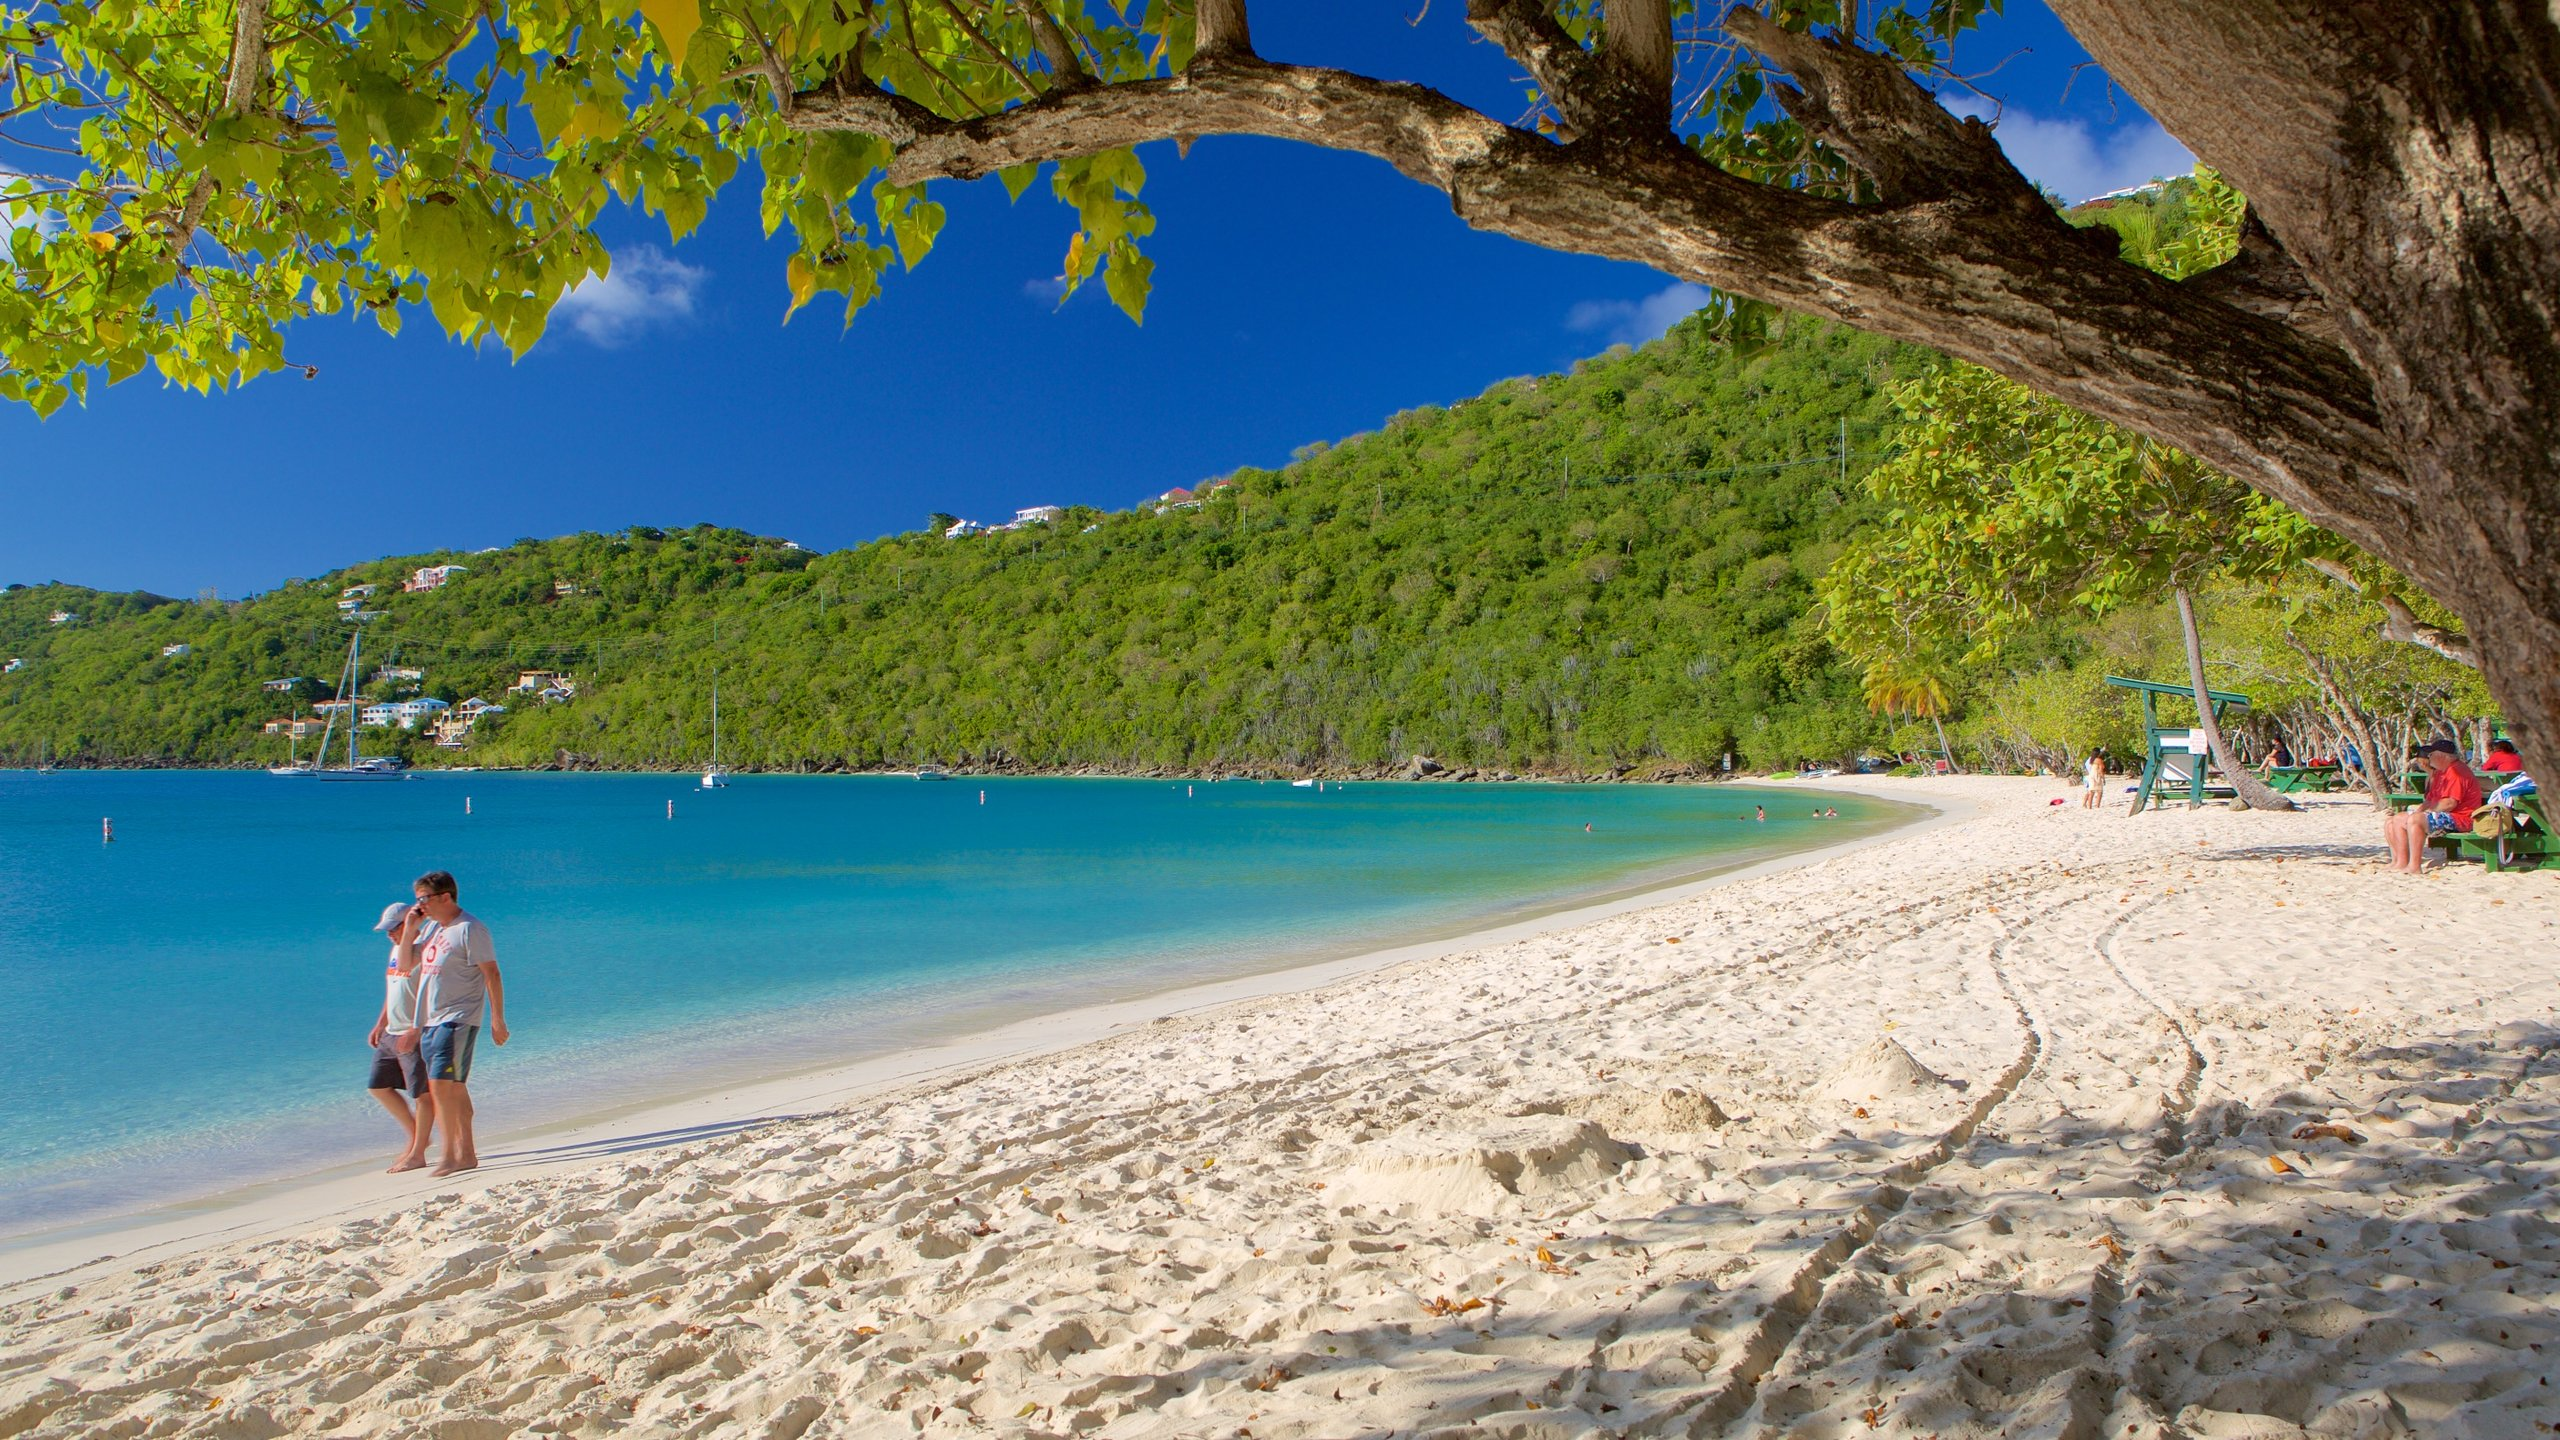 Magens Bay Beach, St. Thomas, U.S. Virgin Islands